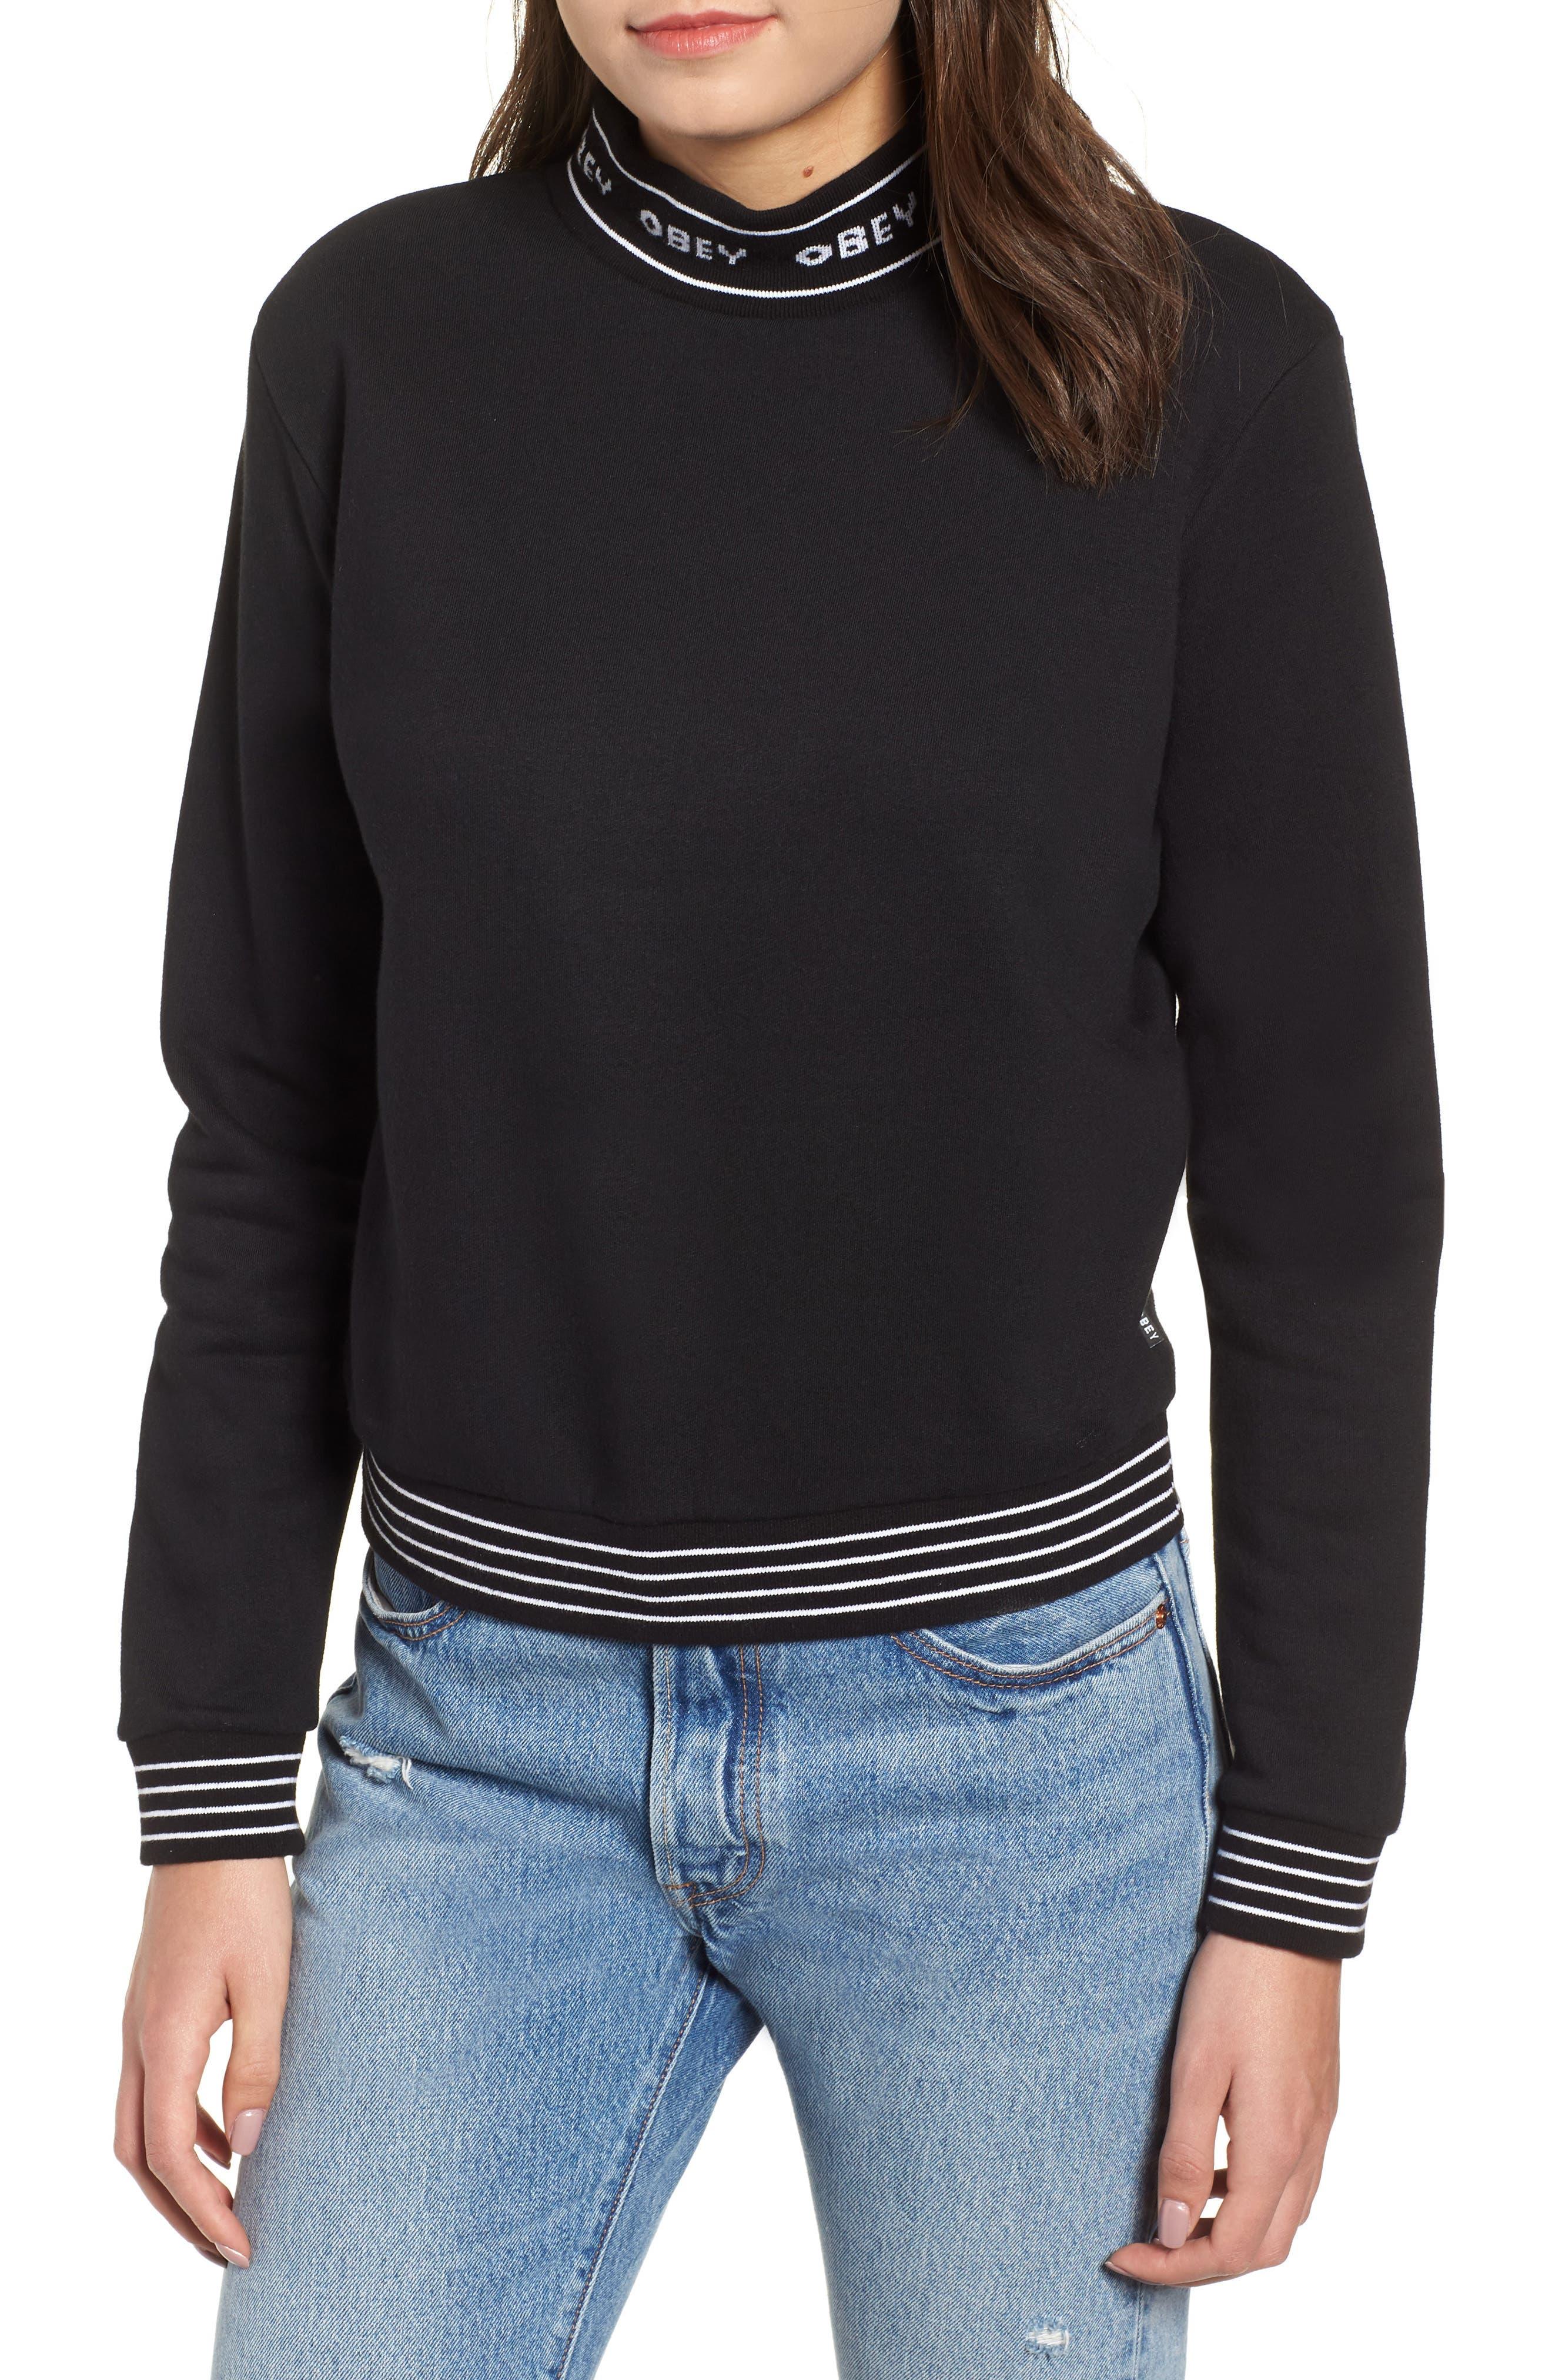 Obey Quincy Cotton Blend Sweatshirt